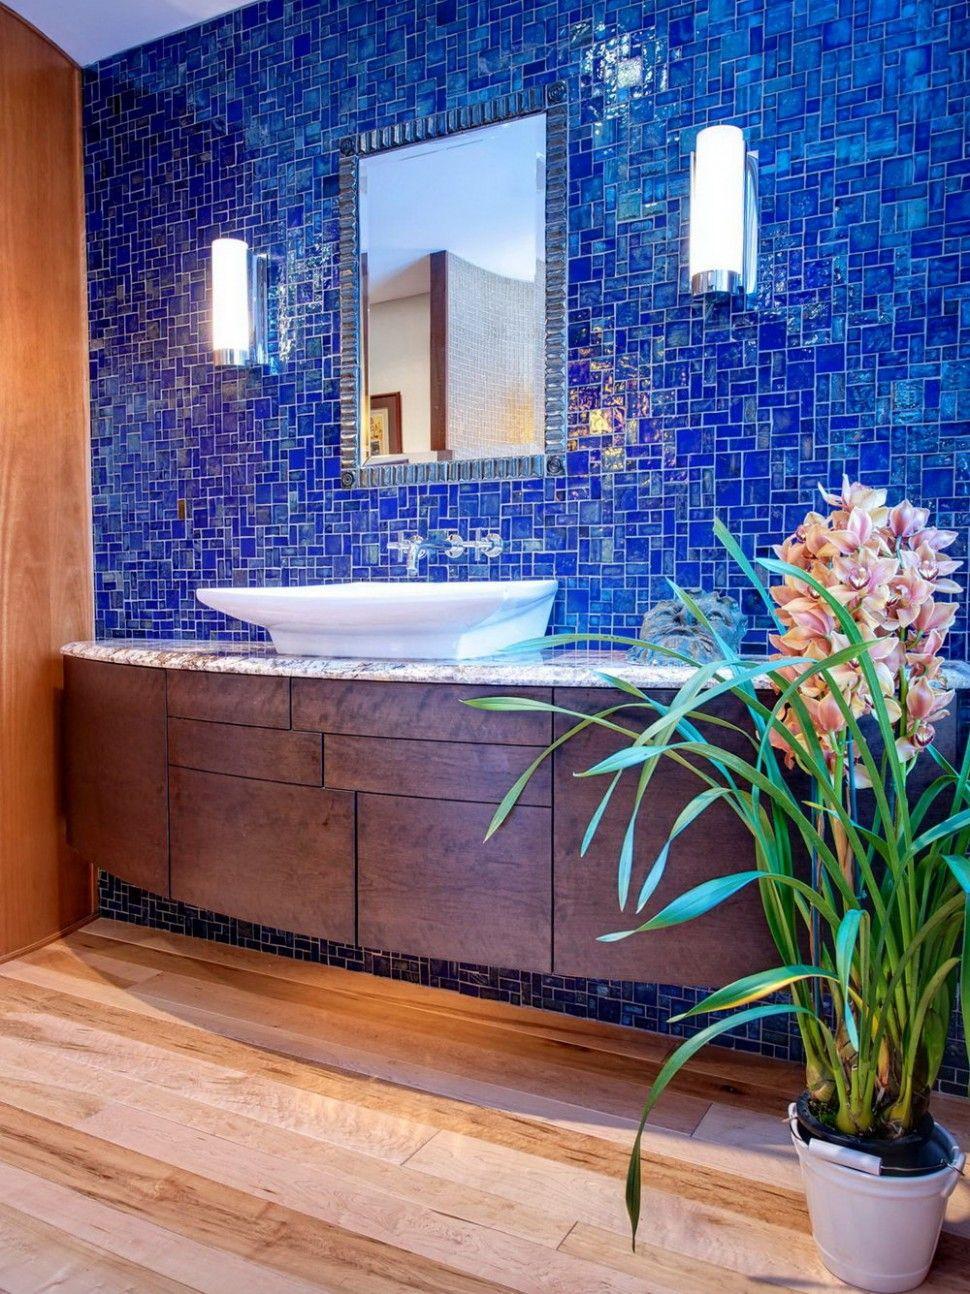 Blue Mosaic Bathroom Ideas in 2020 | Blue bathroom tile ...